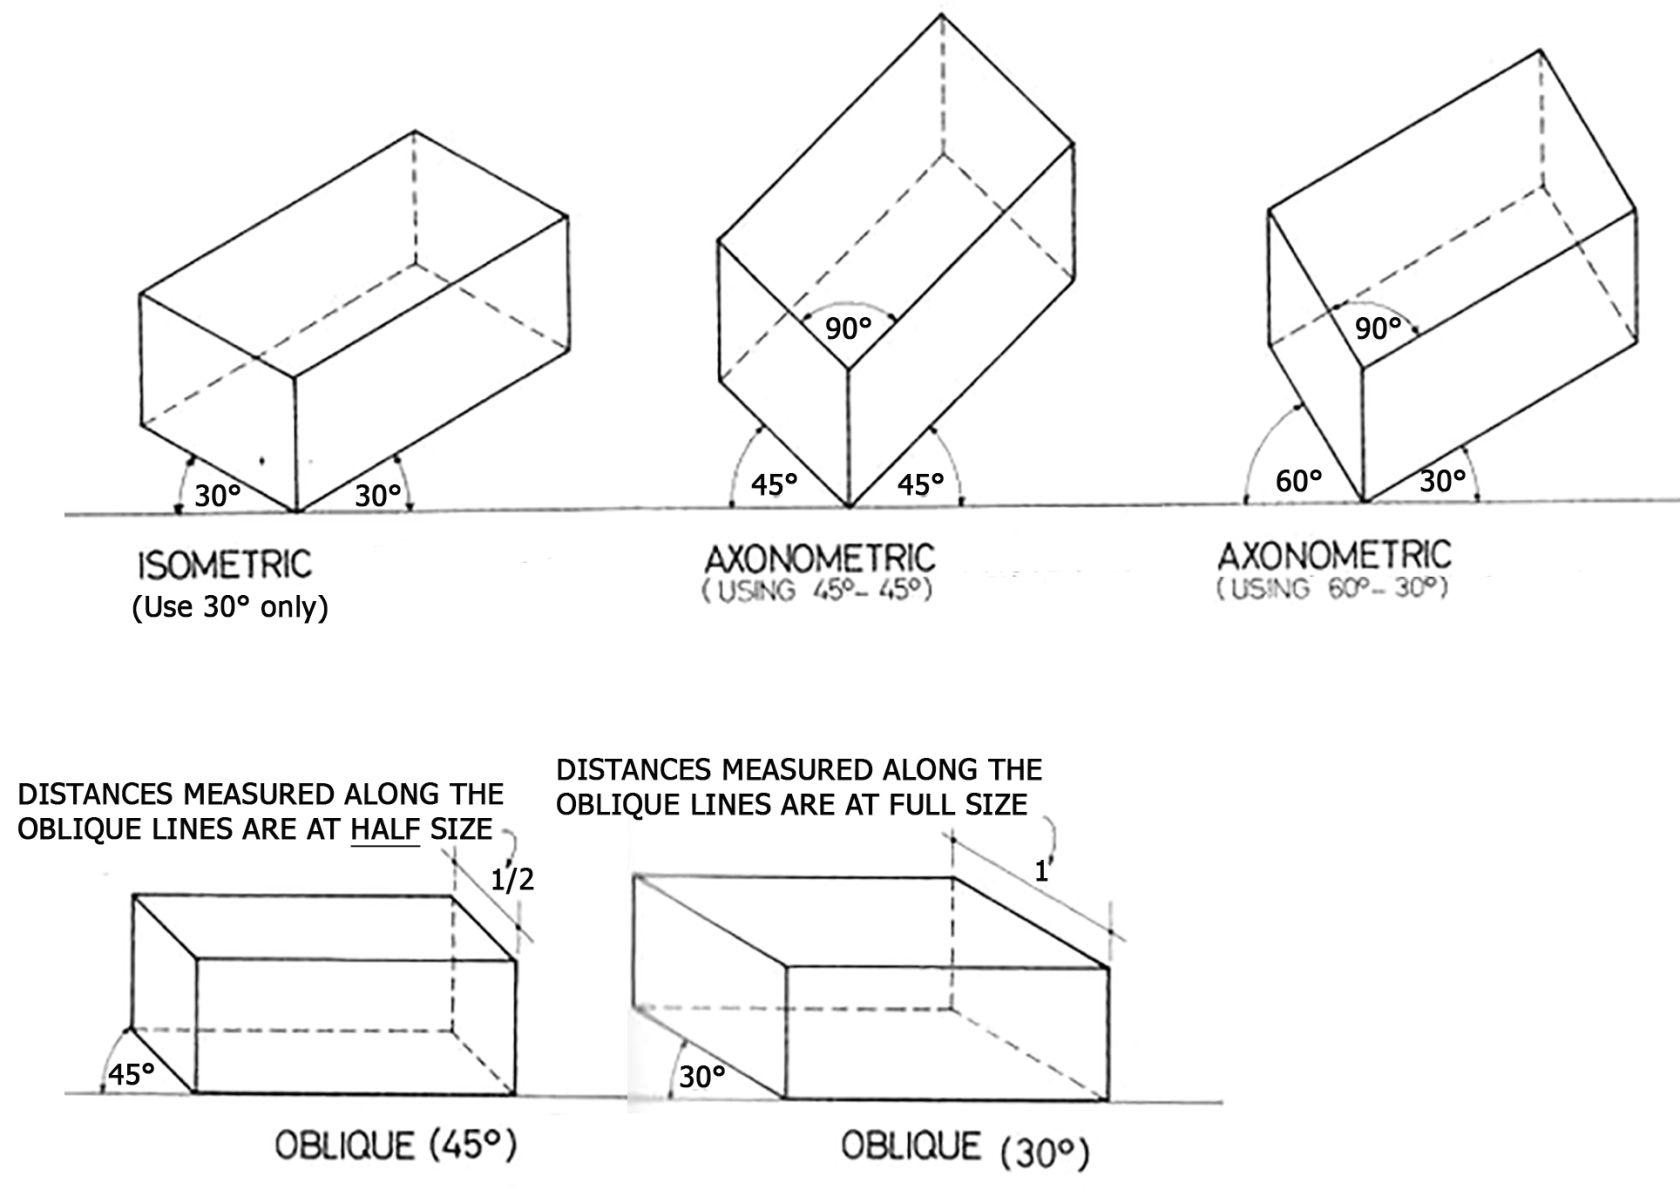 Axonometric Vs Isometric Projection